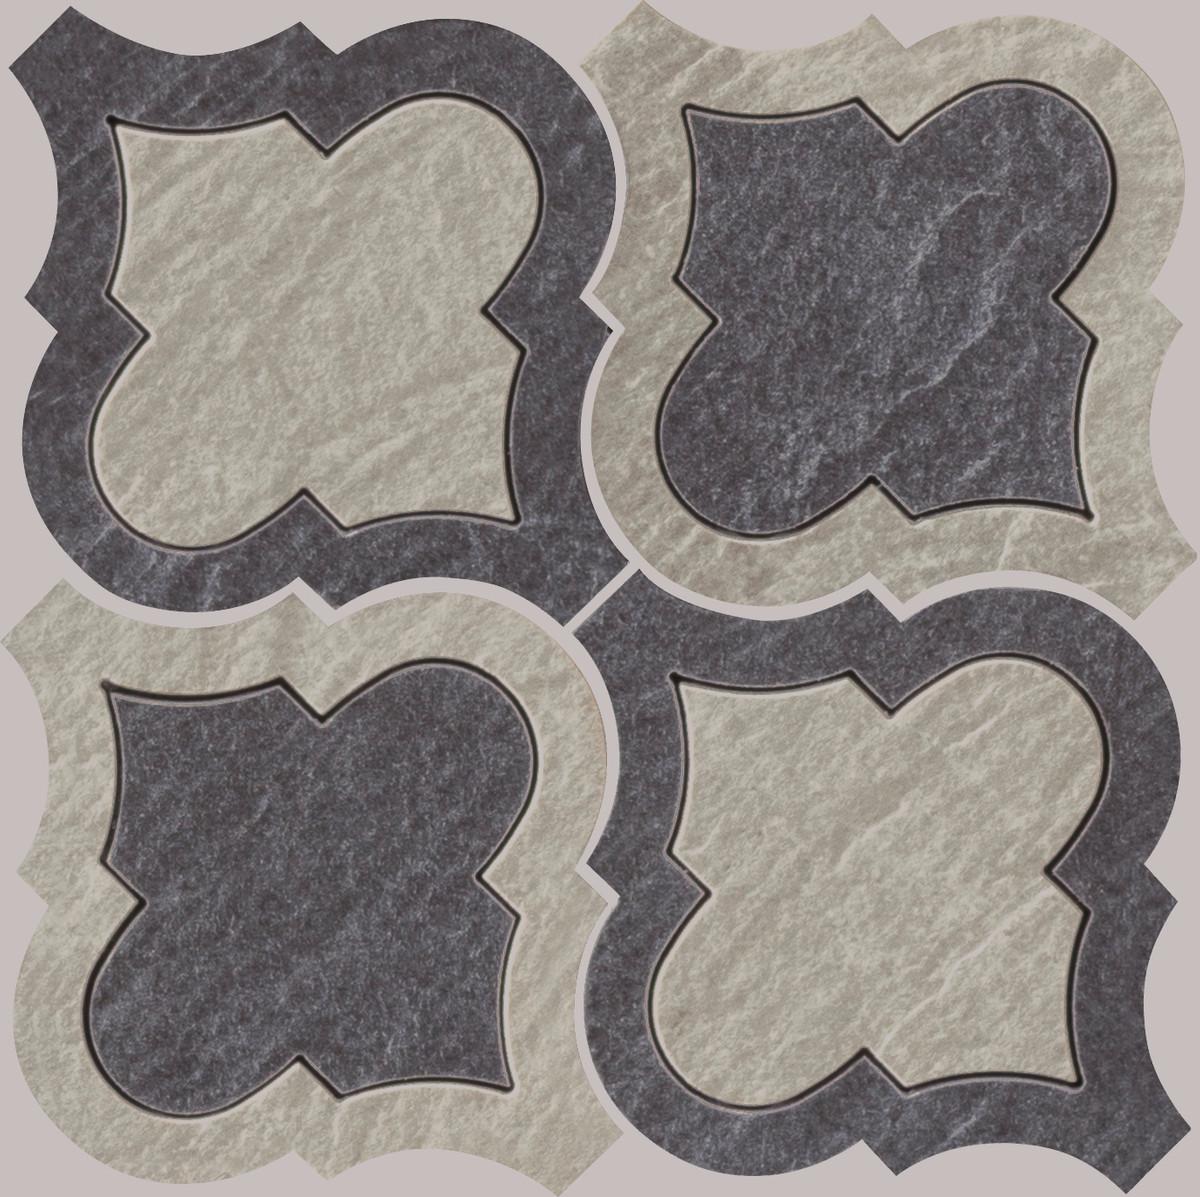 Mosaik Gazzini Slide Intarsio Black/white 21 x21 cm